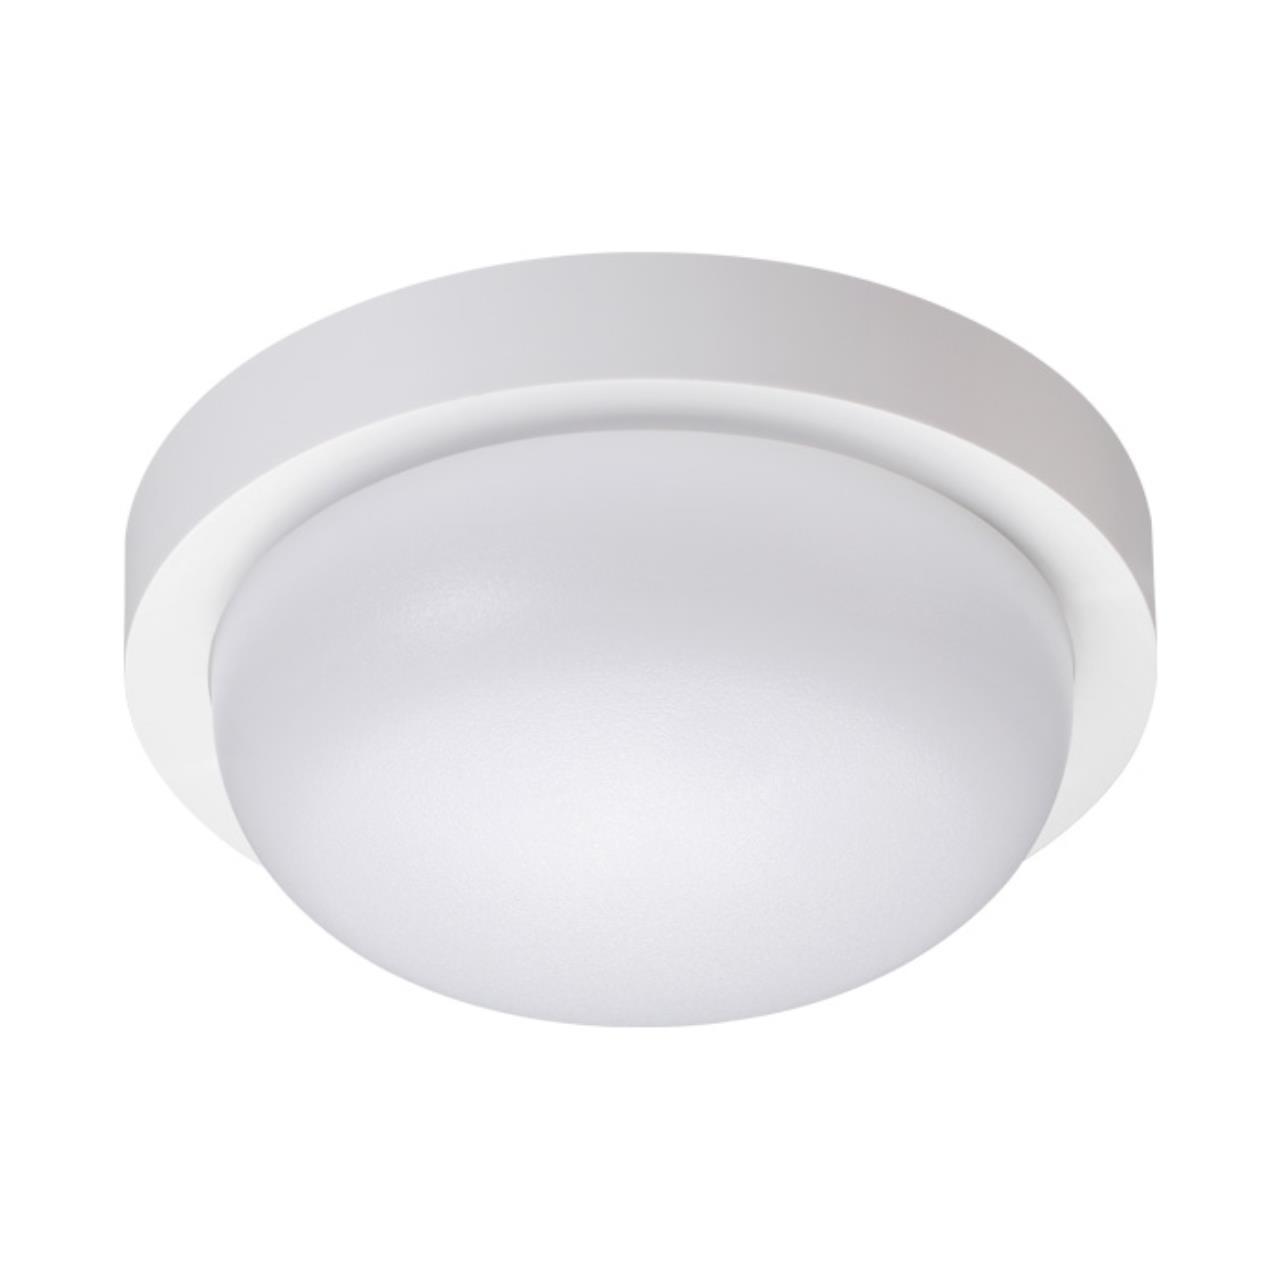 358014 STREET NT19 173 белый Ландшафтный светильник IP65 LED 4000К 12W 220V OPAL